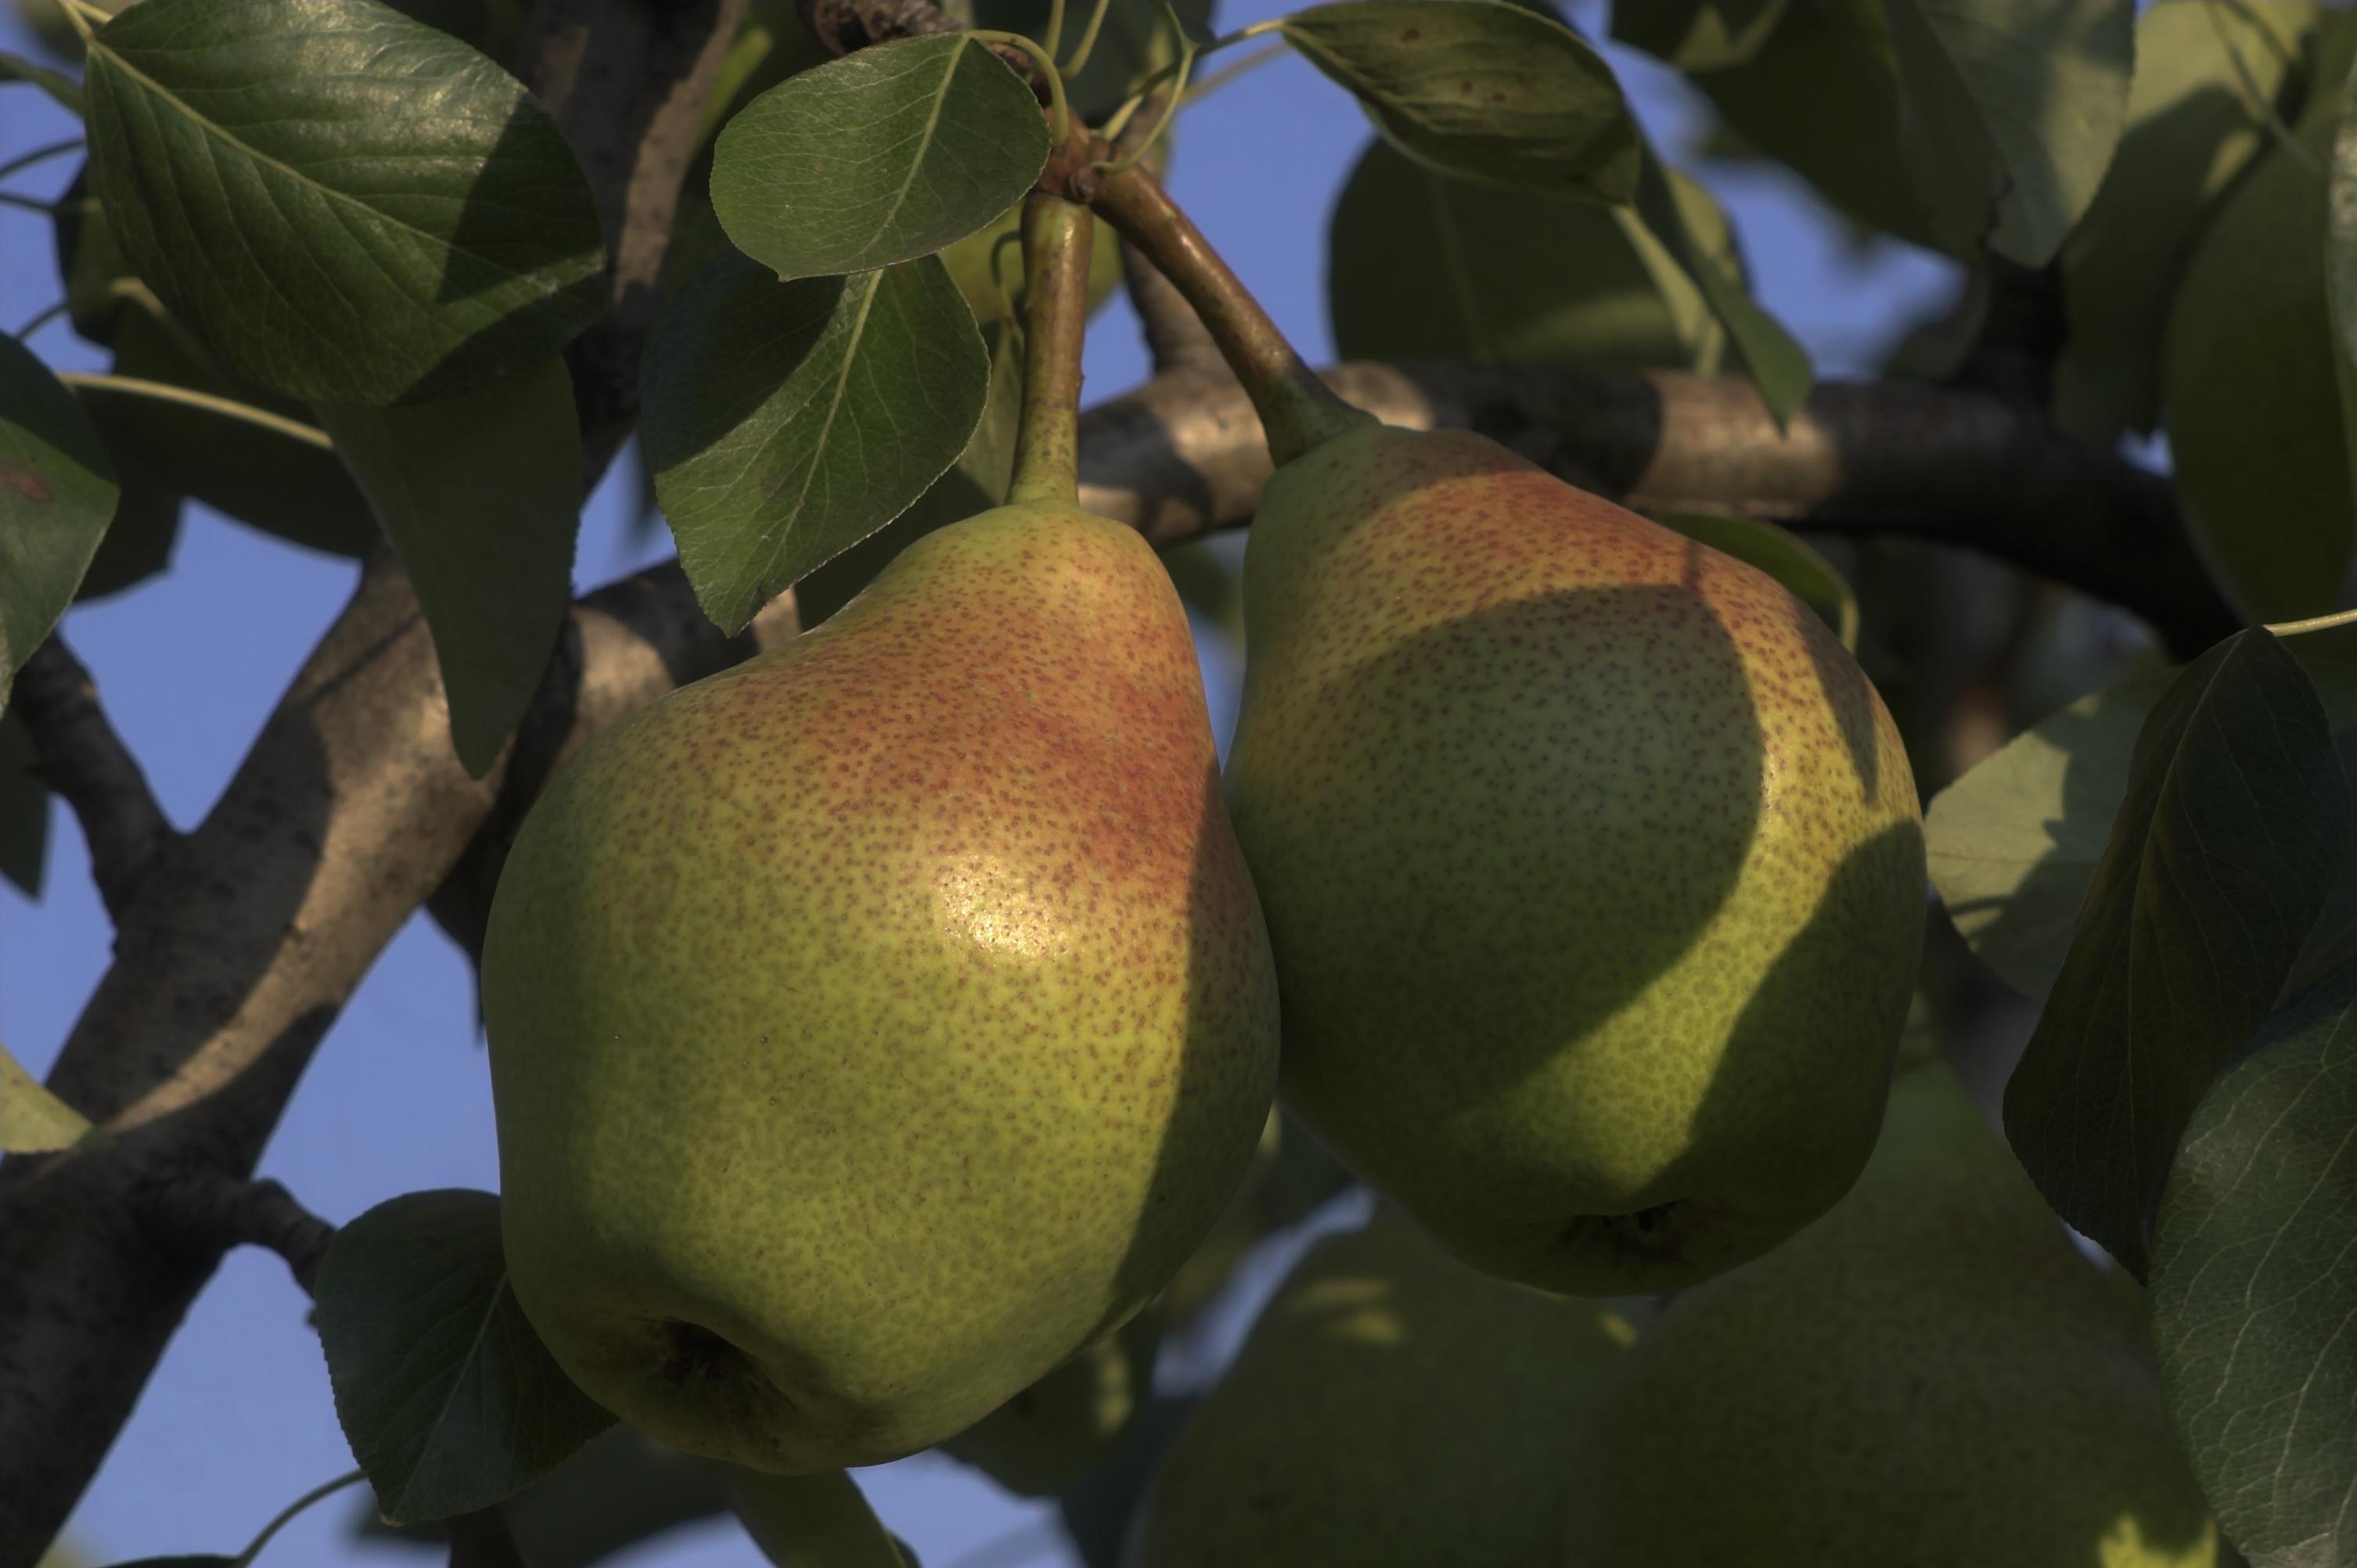 Pears   Fragrance Ingredients   Equinox Aromas